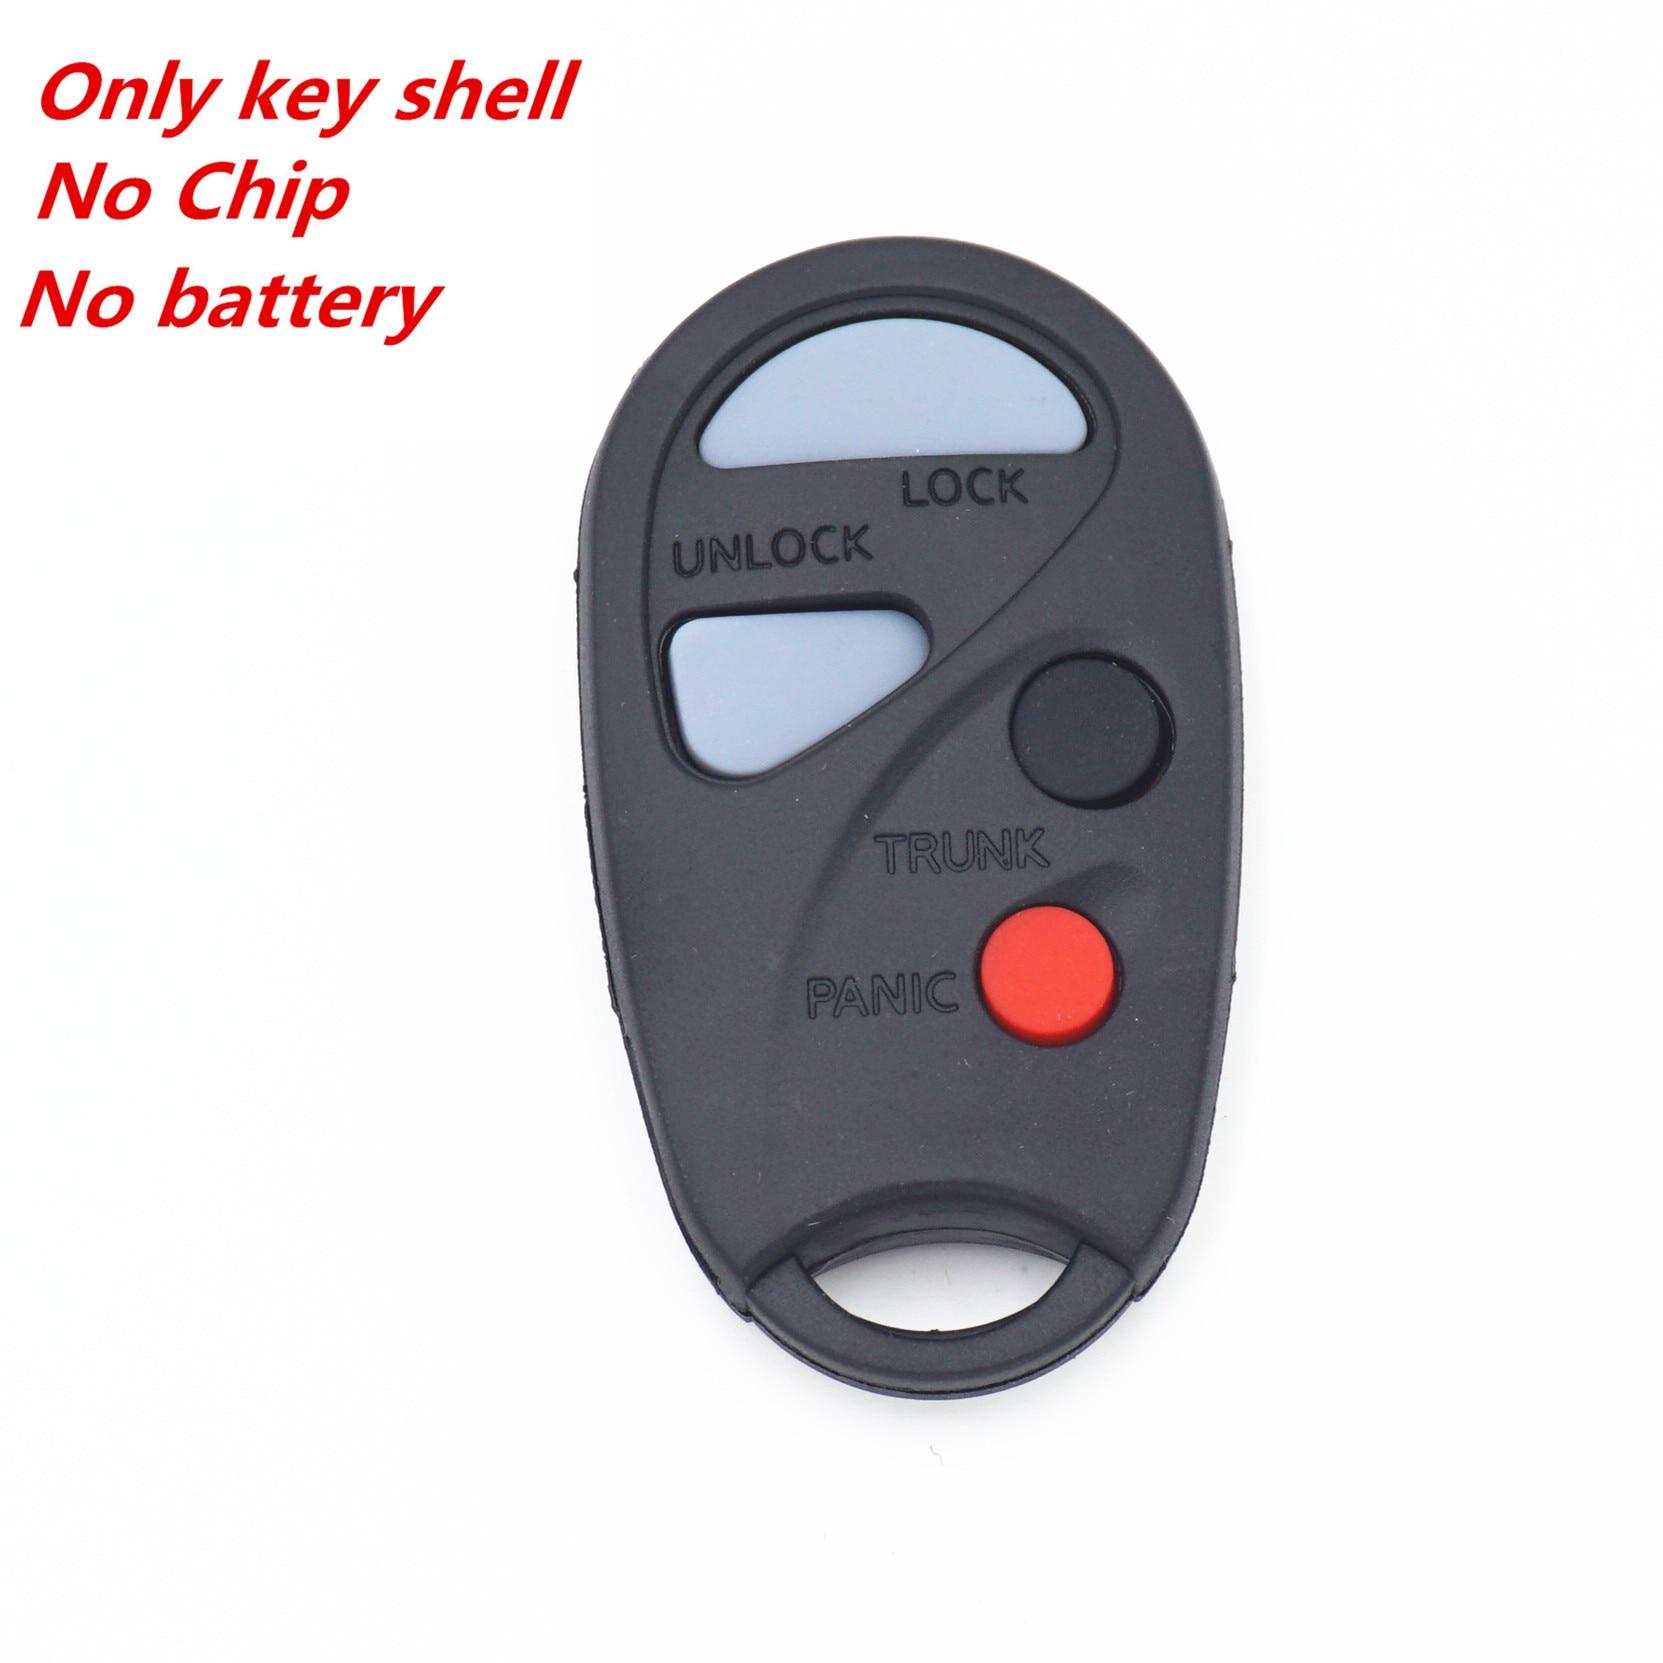 2 For 2000 2001 2002 2003 2004 Infiniti QX4 Ignition Chip Car Transponder Key